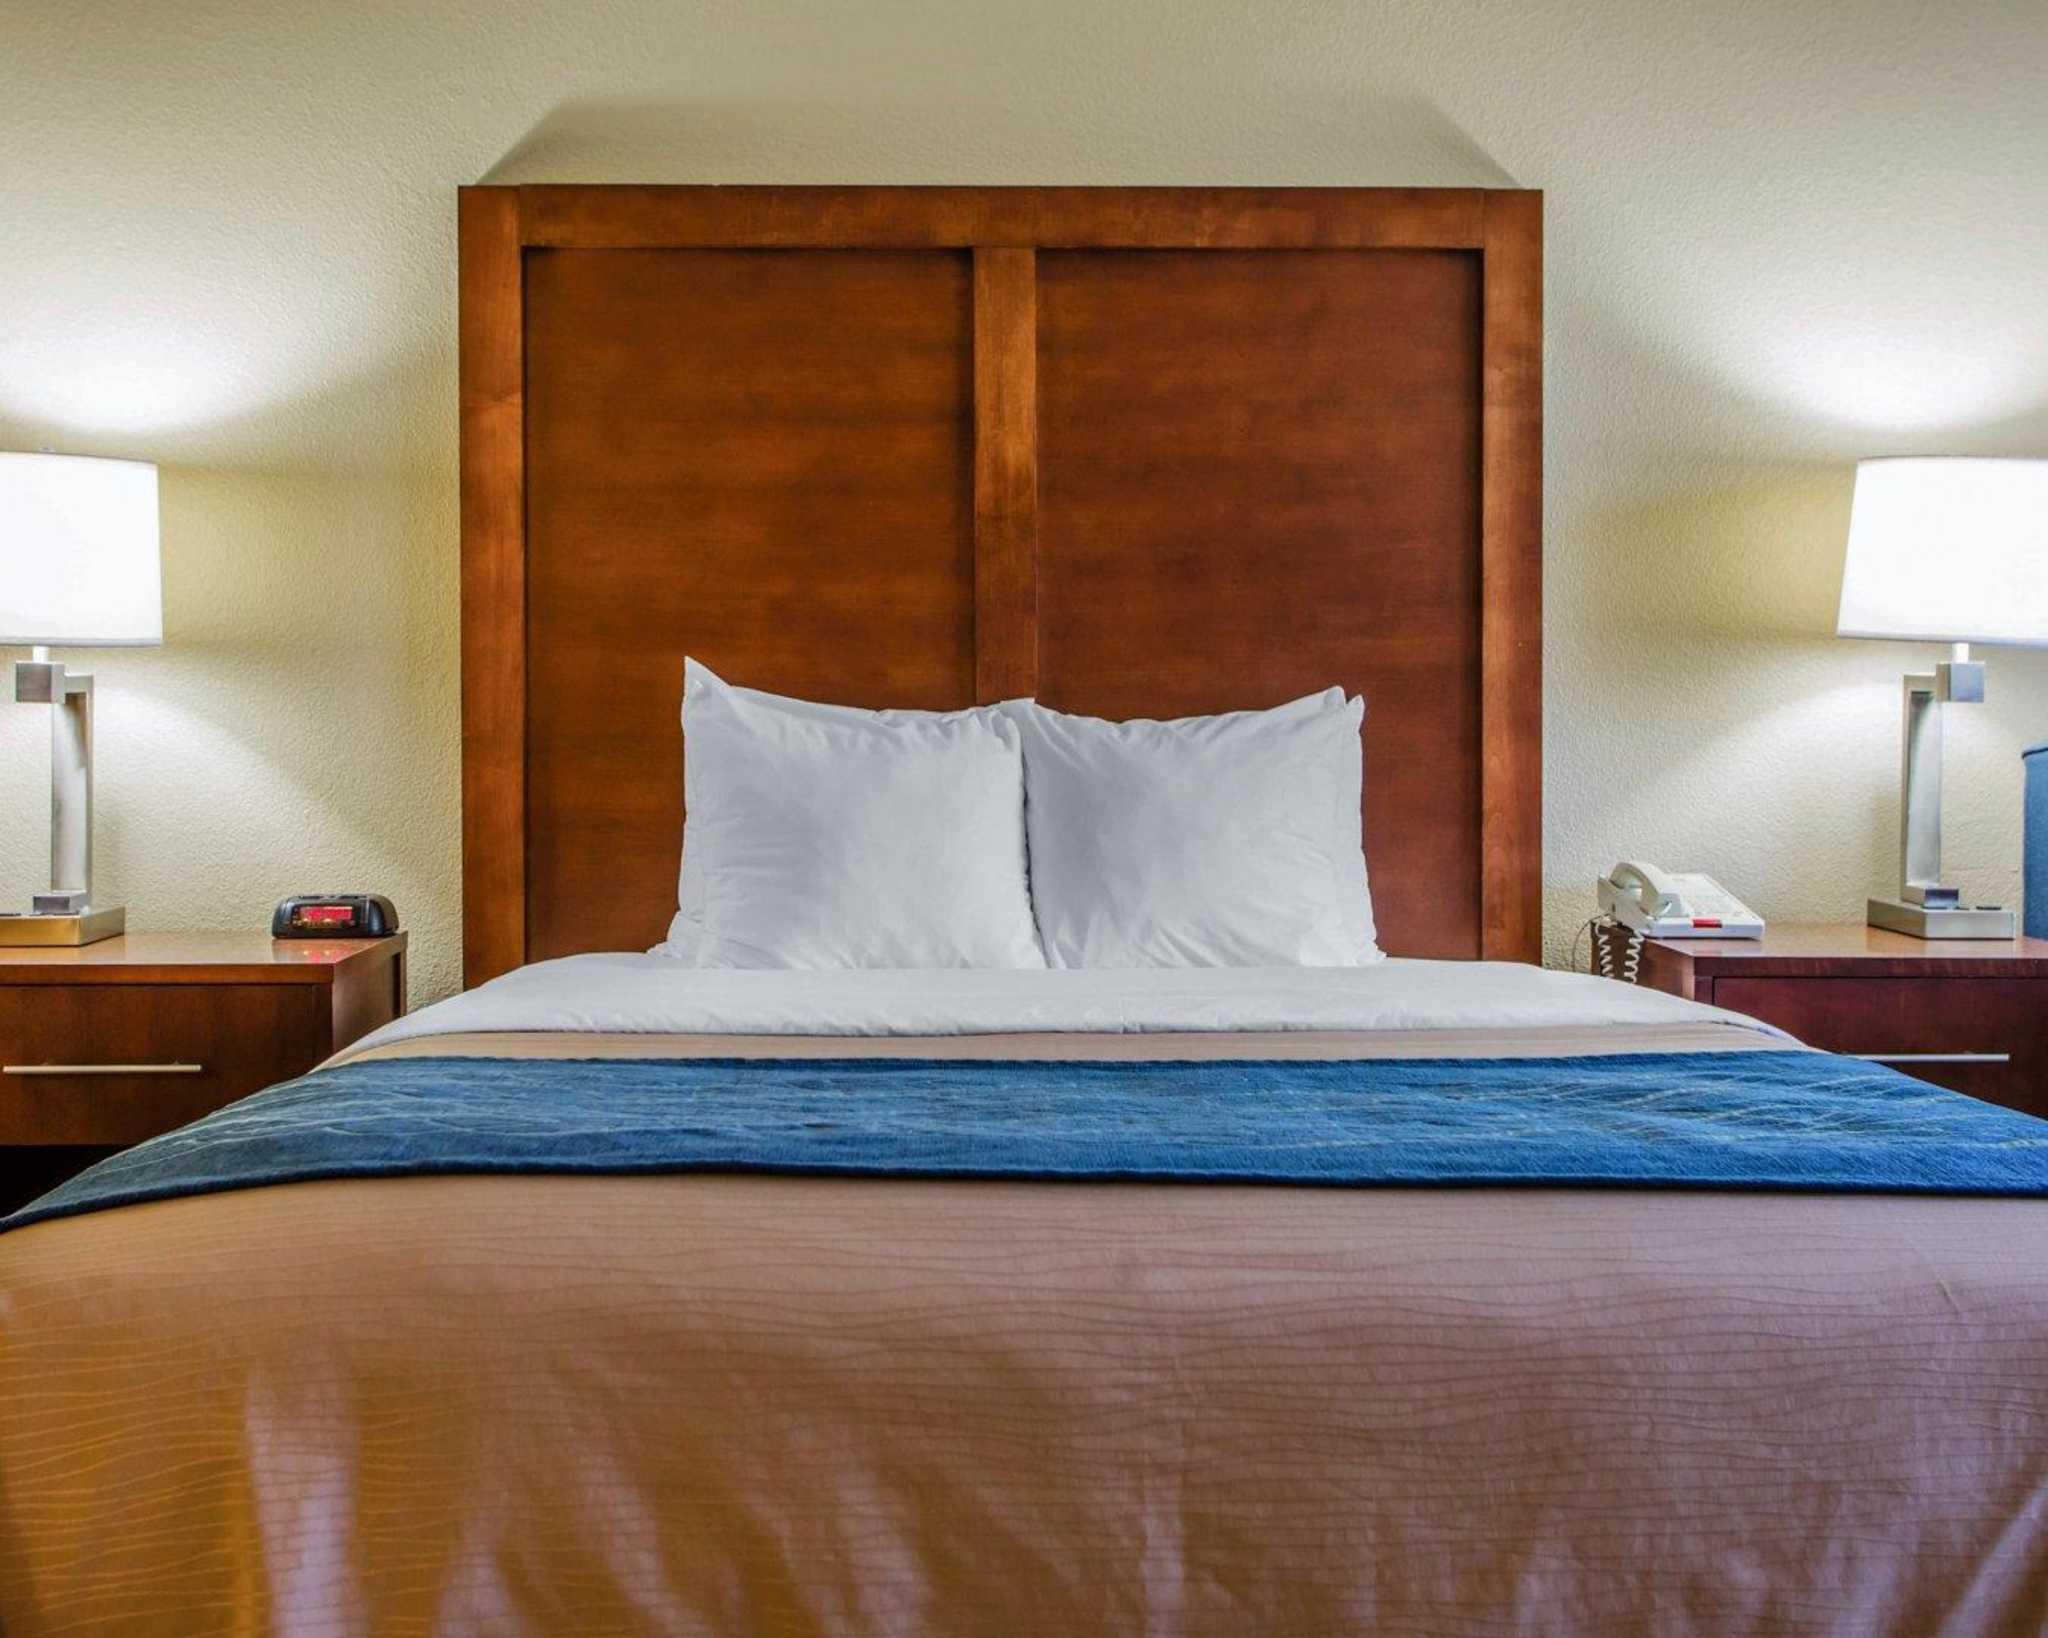 Comfort Inn & Suites Jackson - West Bend image 4